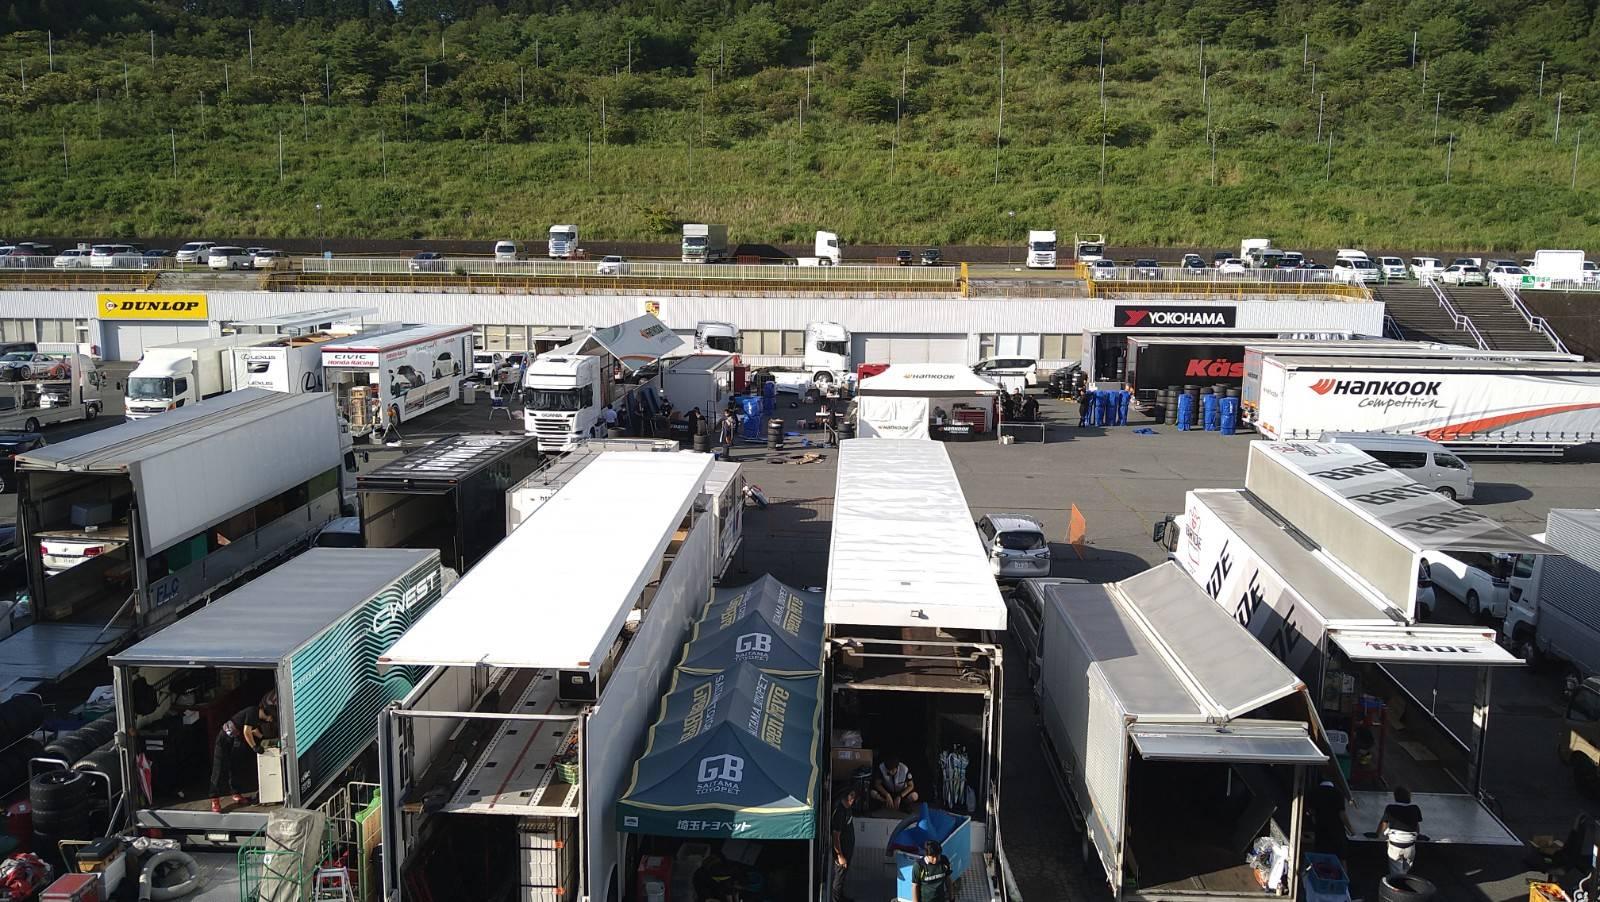 TKU スーパー耐久レース in オートポリス Part.3